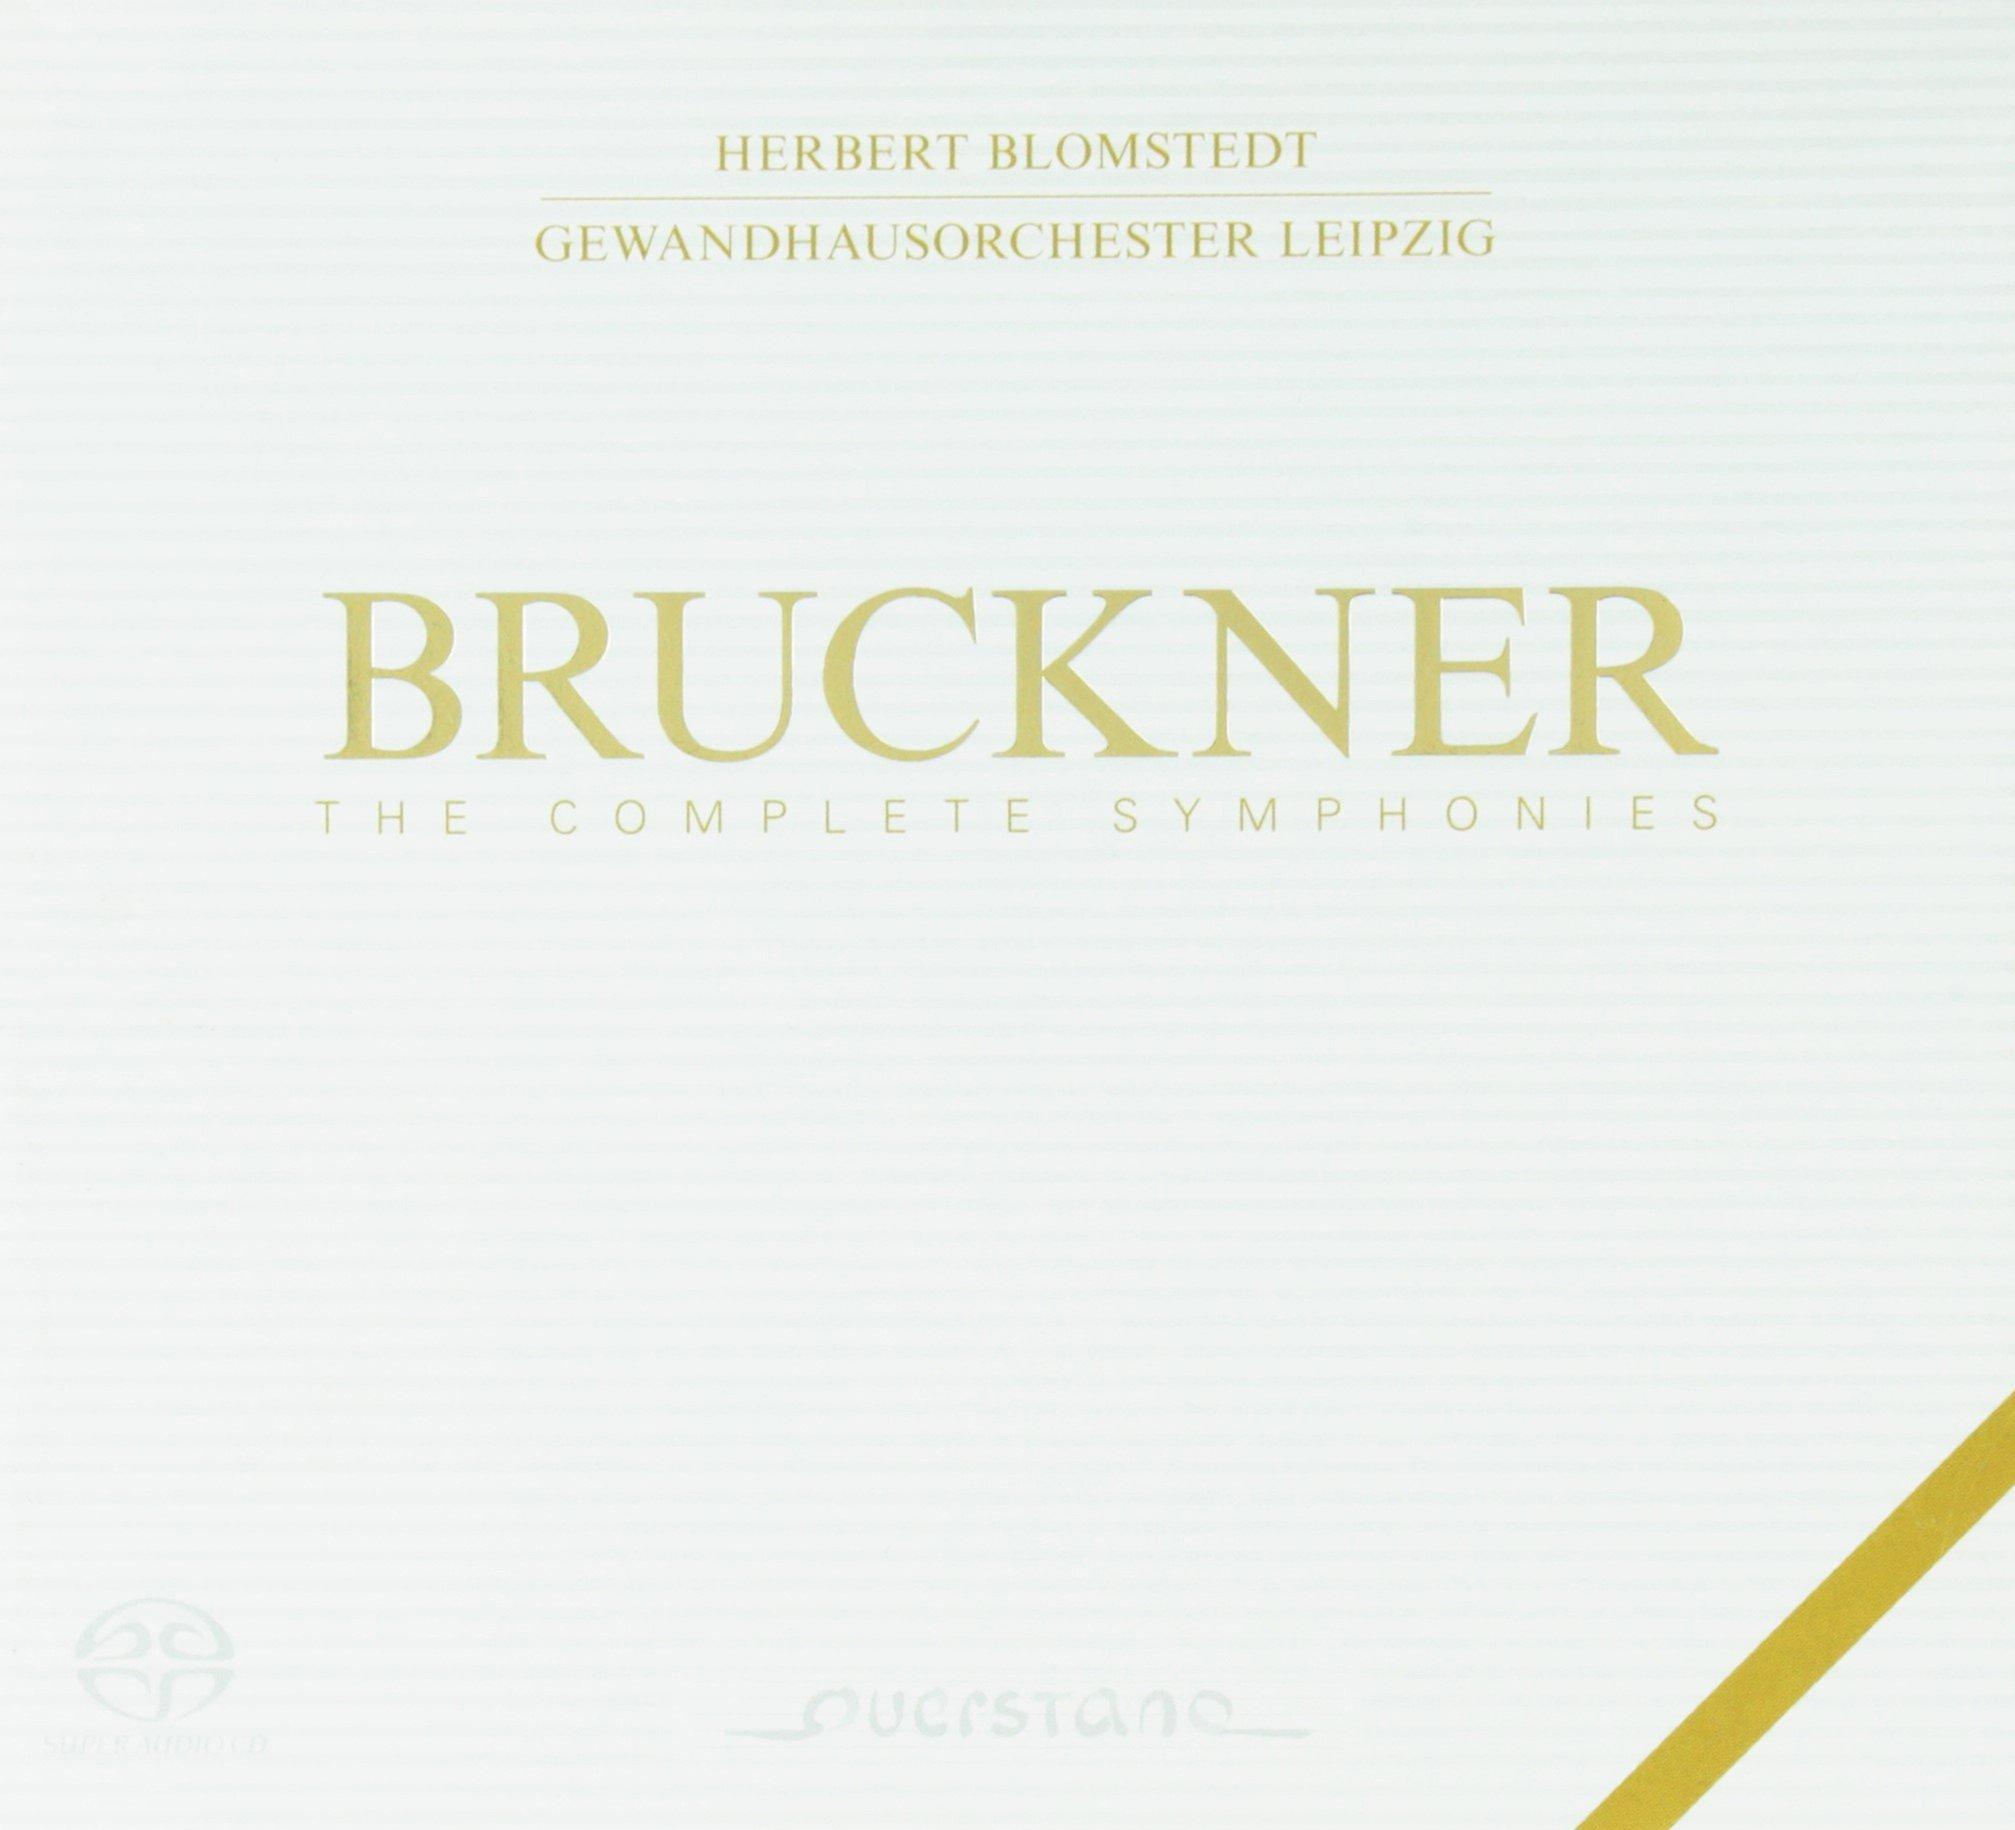 Bruckner: The Complete Symphonies by Allegro